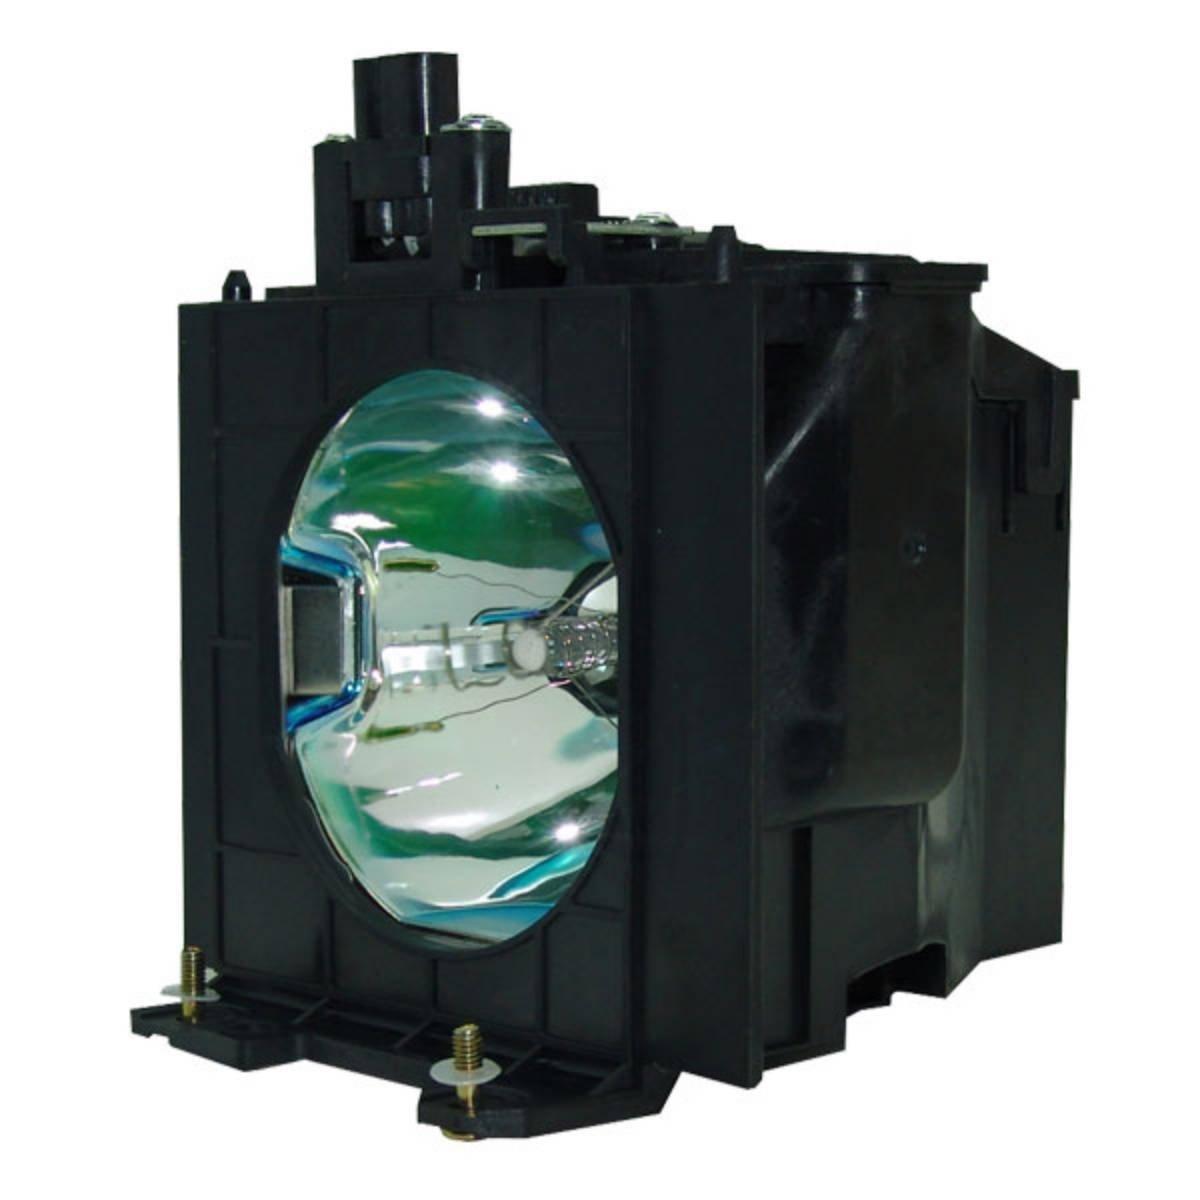 ET-LAD57W LAD57W Lamp For Panasonic PT-D5700 PT-D5700E PT-D5700EL PT-D5700UL PT-DW5100E PT-DW5100UL PT-DW5100 Projector Bulb replacement projector lamp et lad57 for panasonic pt dw5100 pt d5700l pt d5700 pt d5700e pt d5700el pt d5700u pt d5700ul